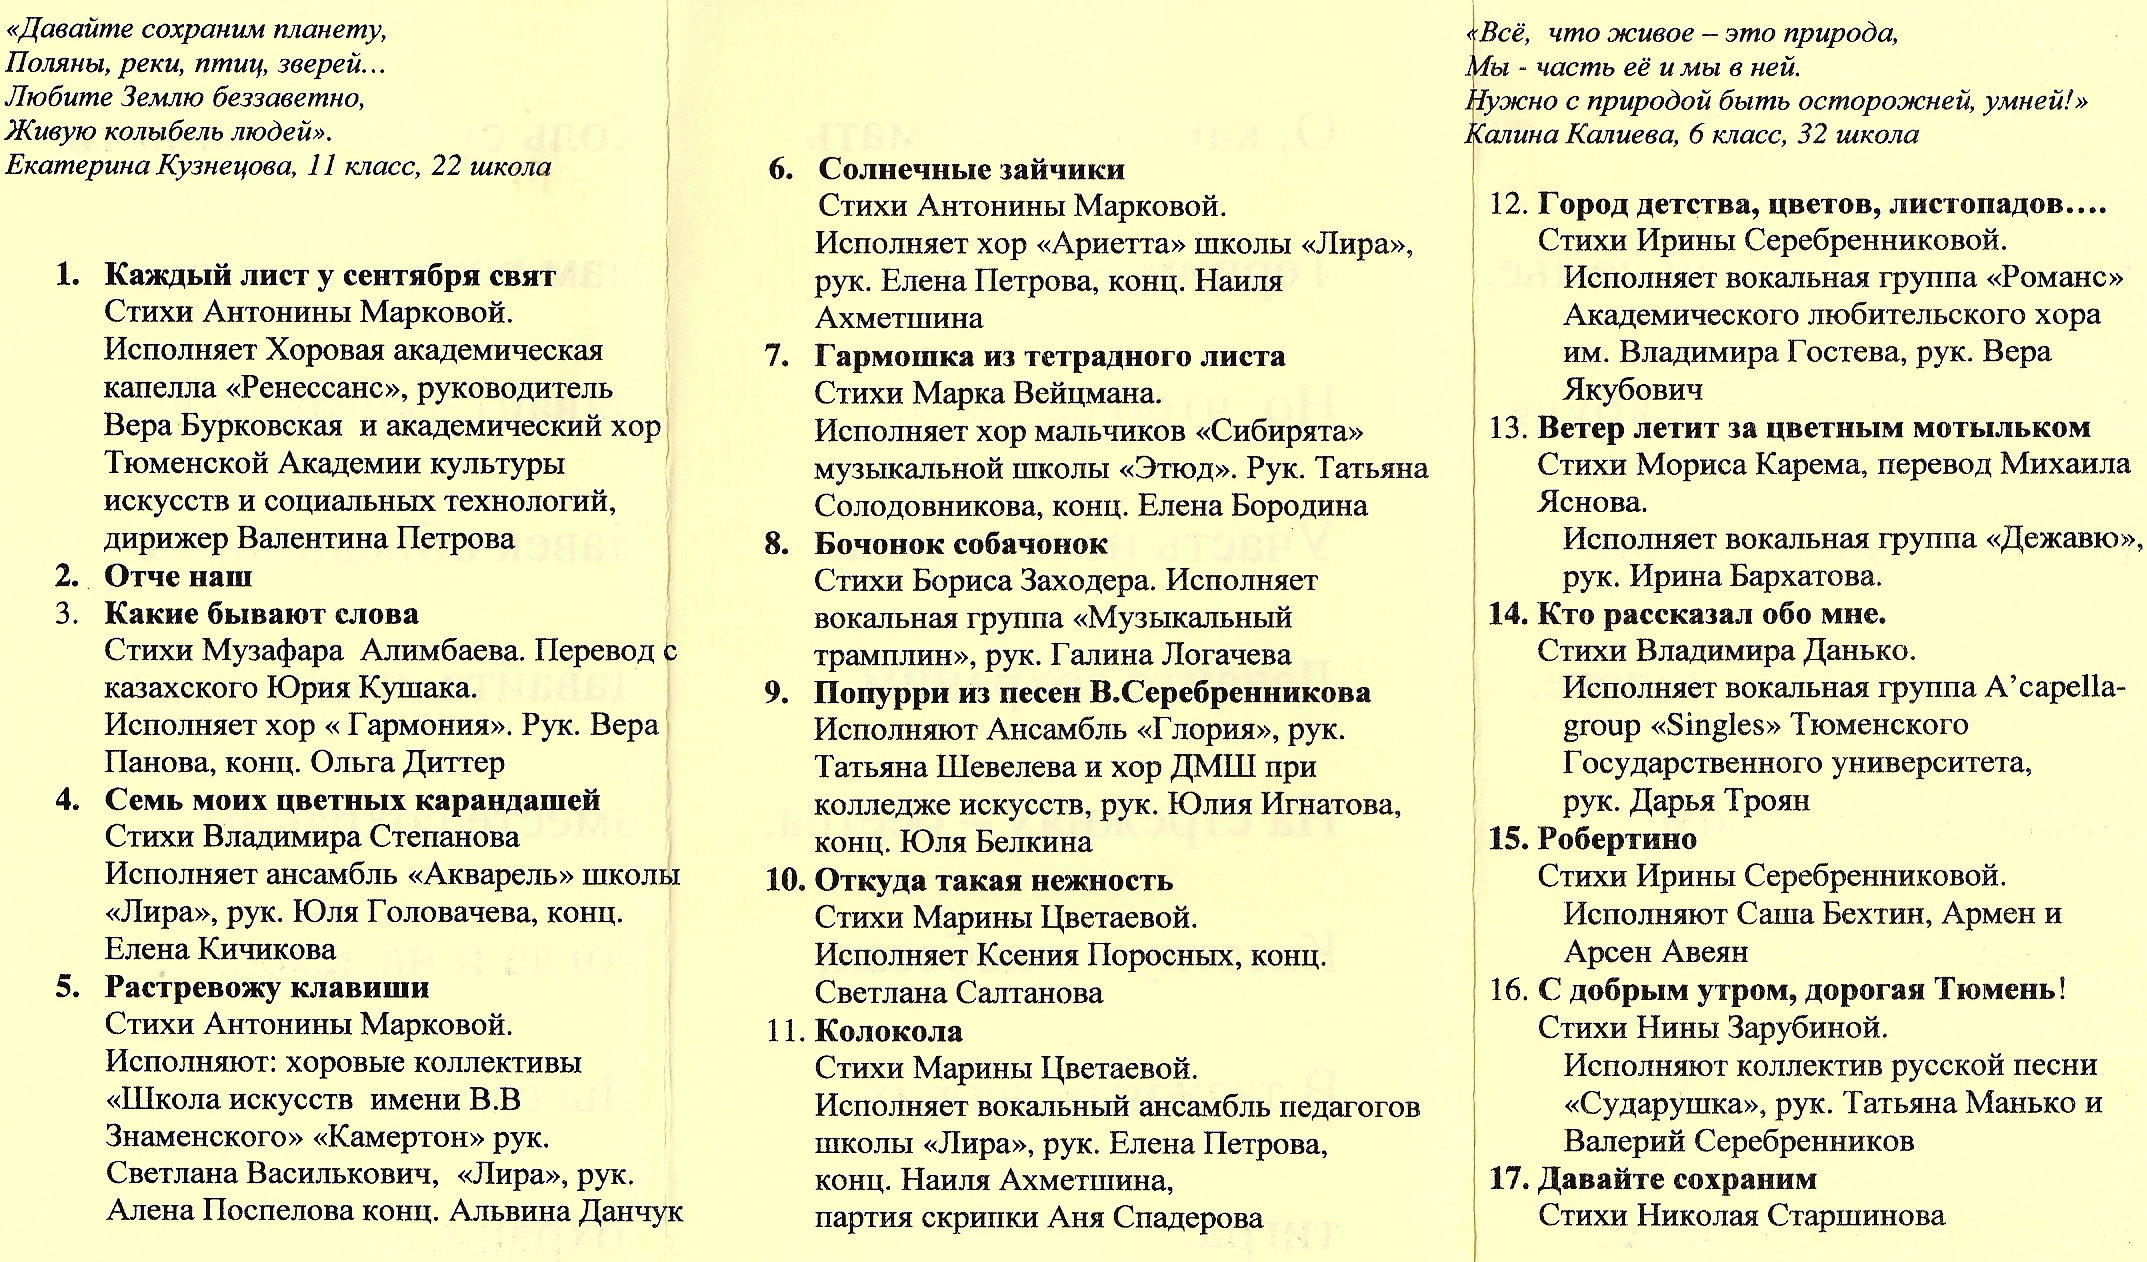 Валерий Серебренников. Программа хорового форума Давайте сохраним